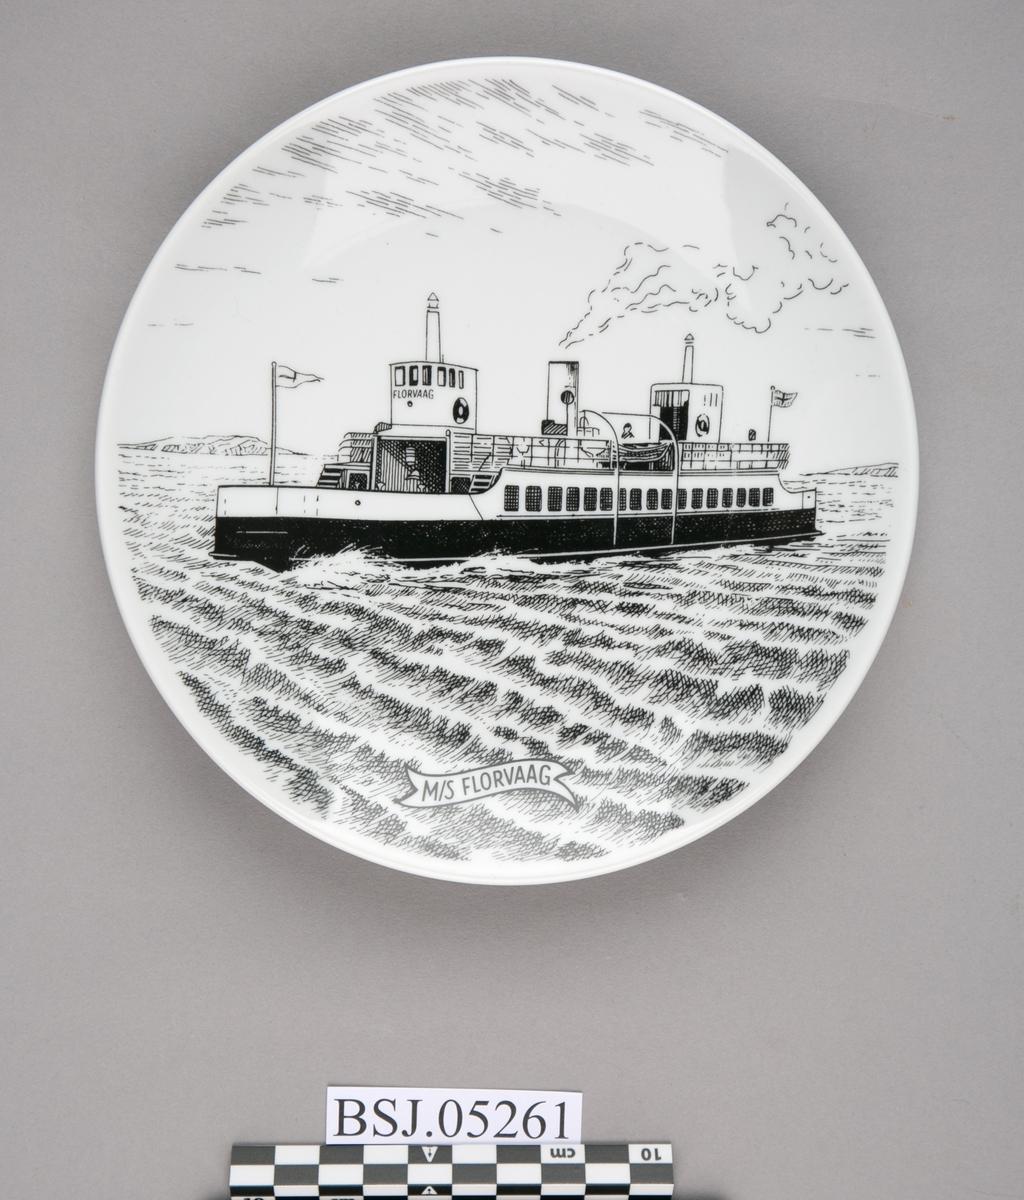 Platte med motiv av MS FLORVAAG under fart i åpen sjø.